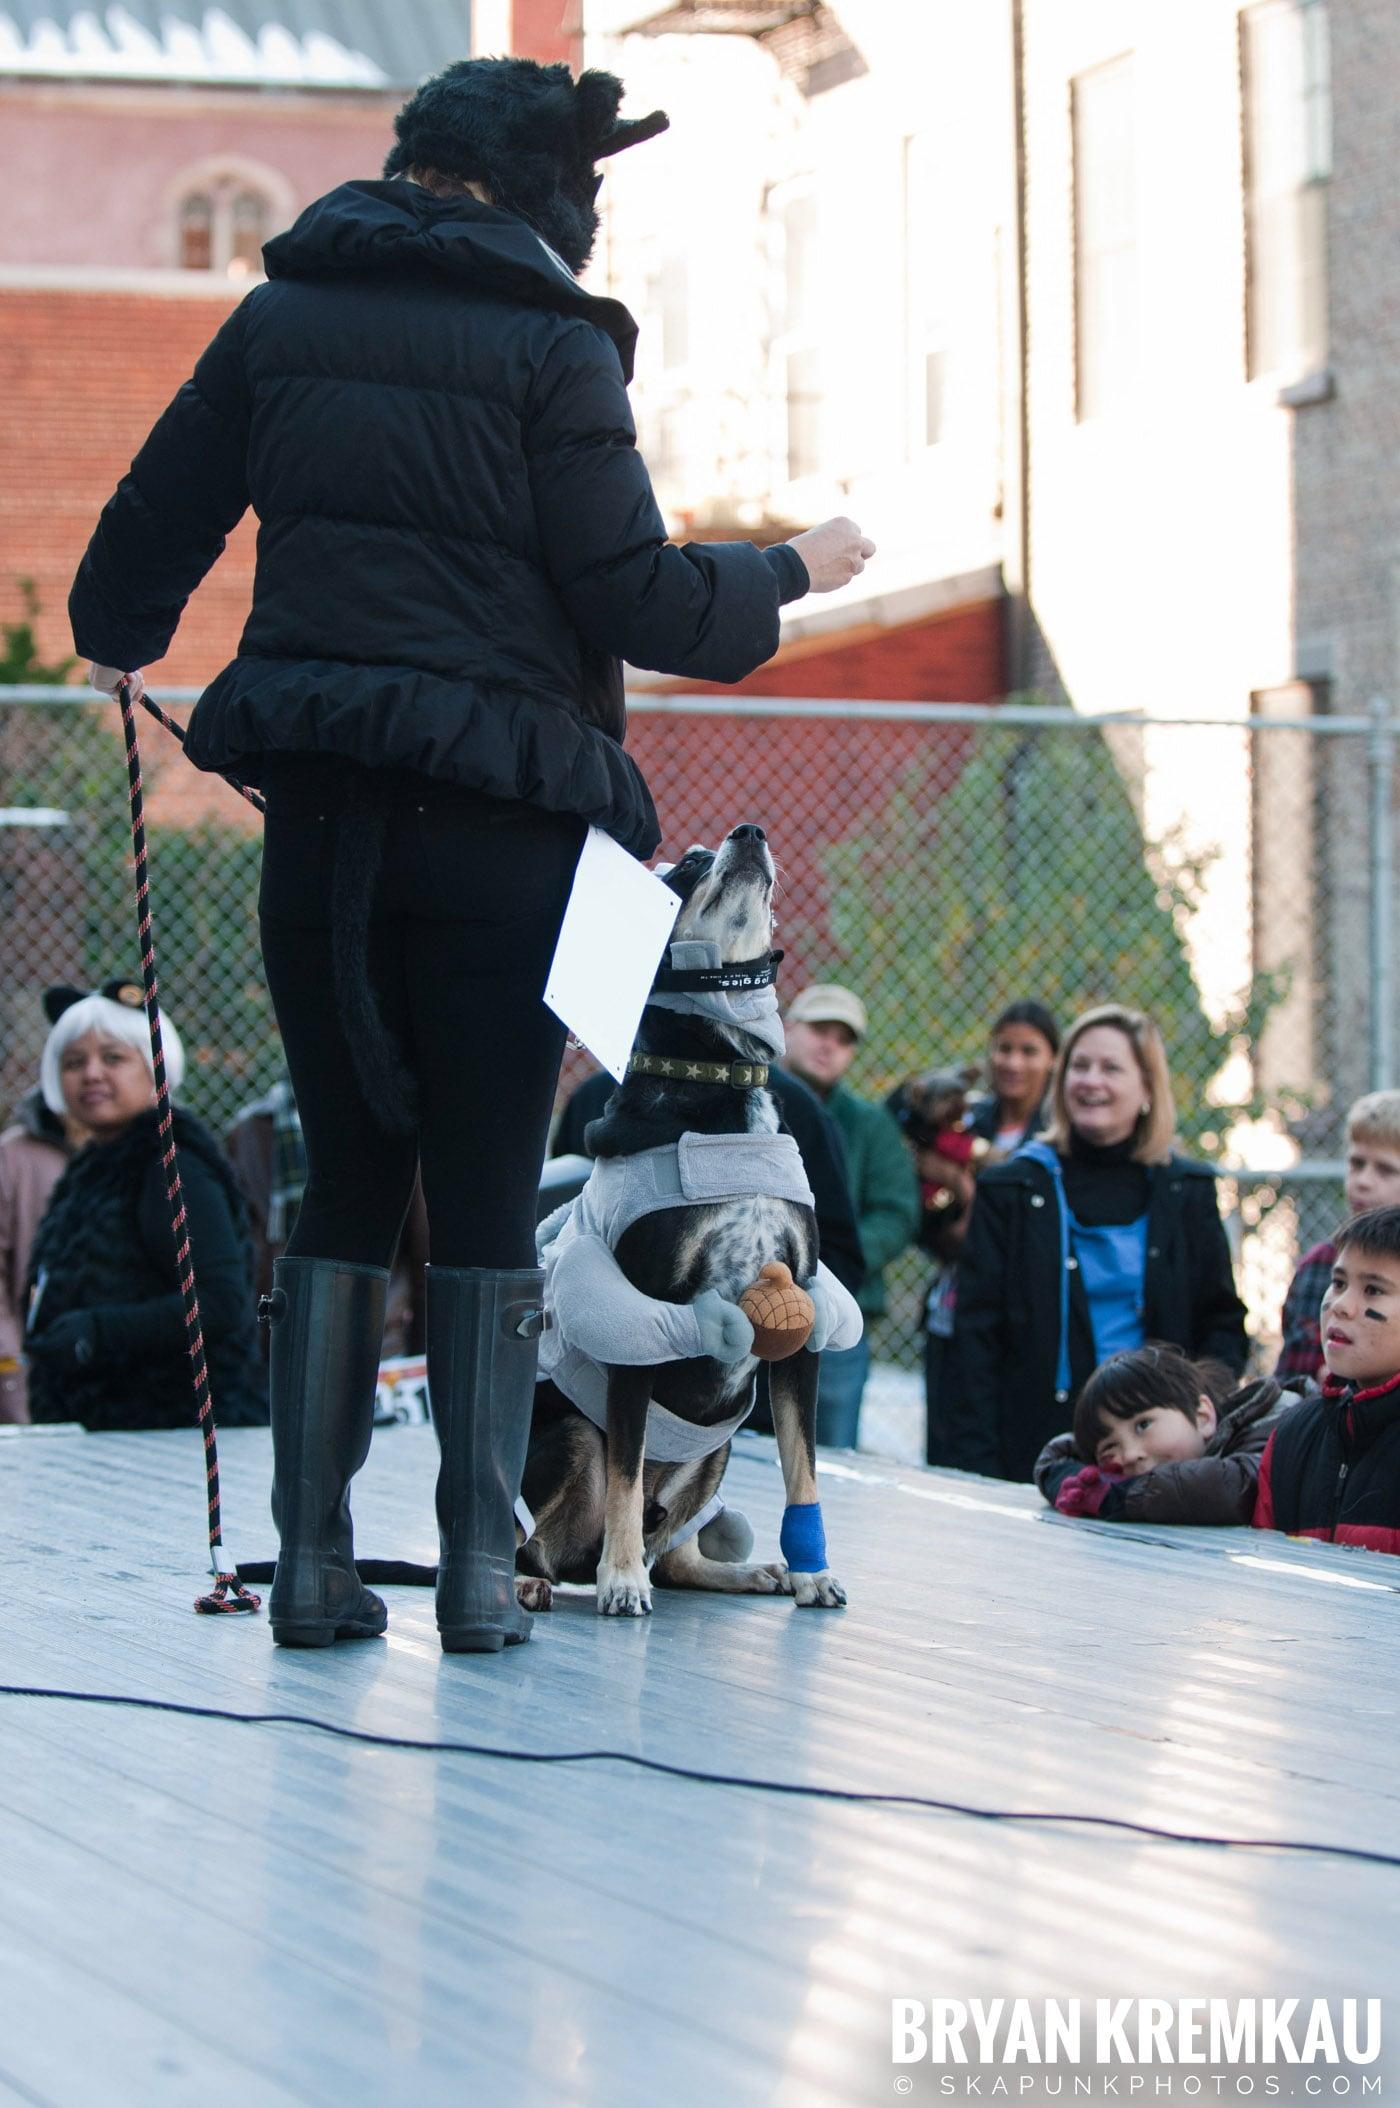 Paulus Hook Halloween Pet Parade 2011 @ Jersey City, NJ - 10.30.11 (6)